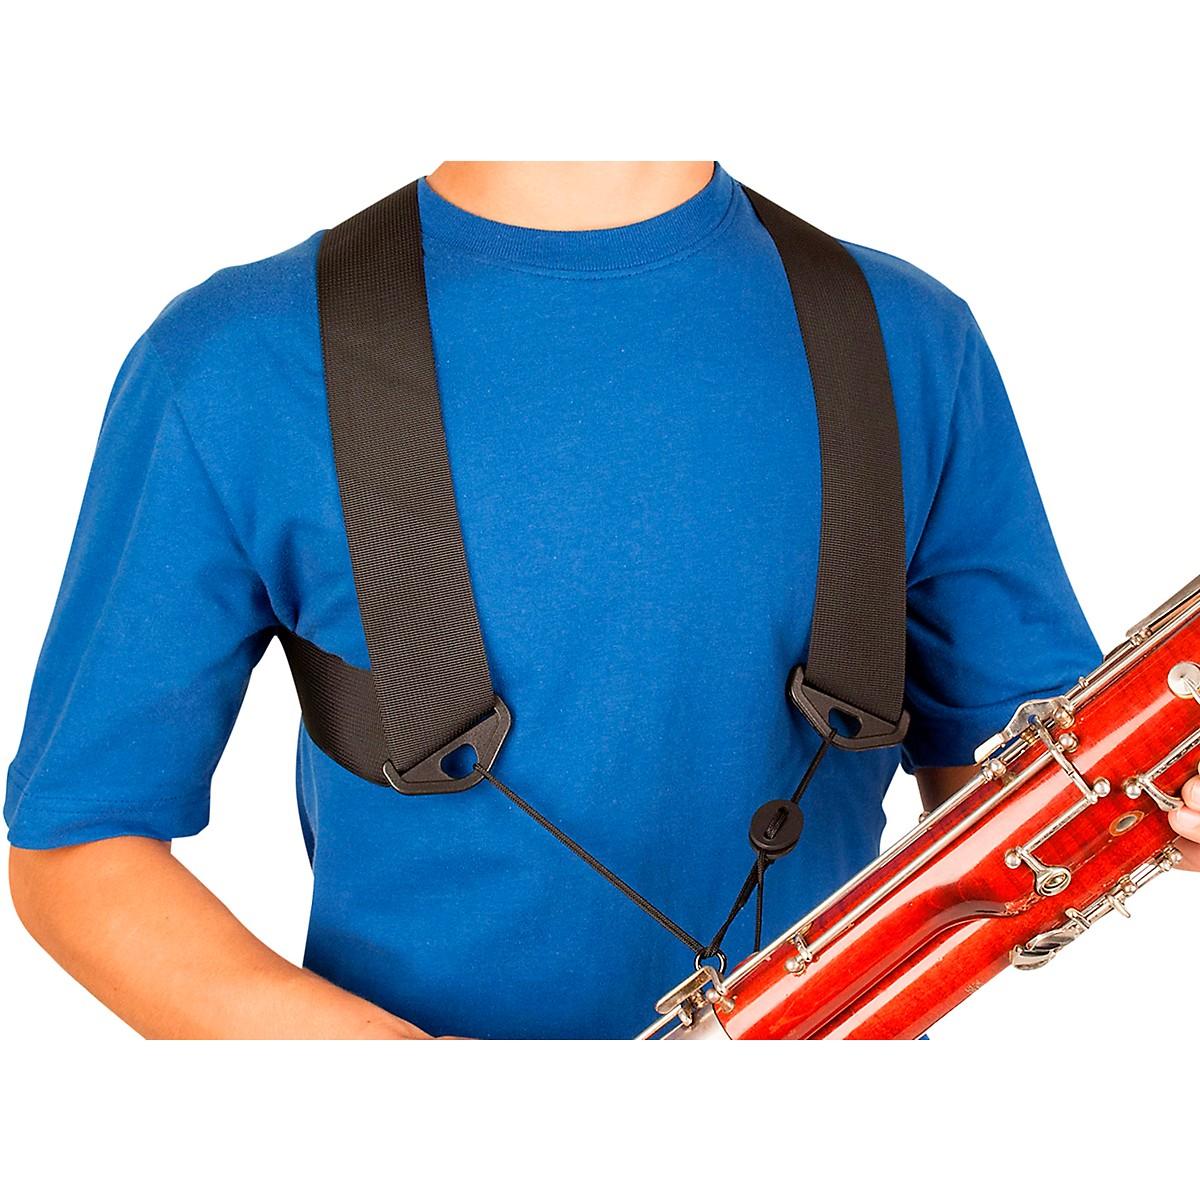 Protec Bassoon Nylon Harness (Large, Unisex)